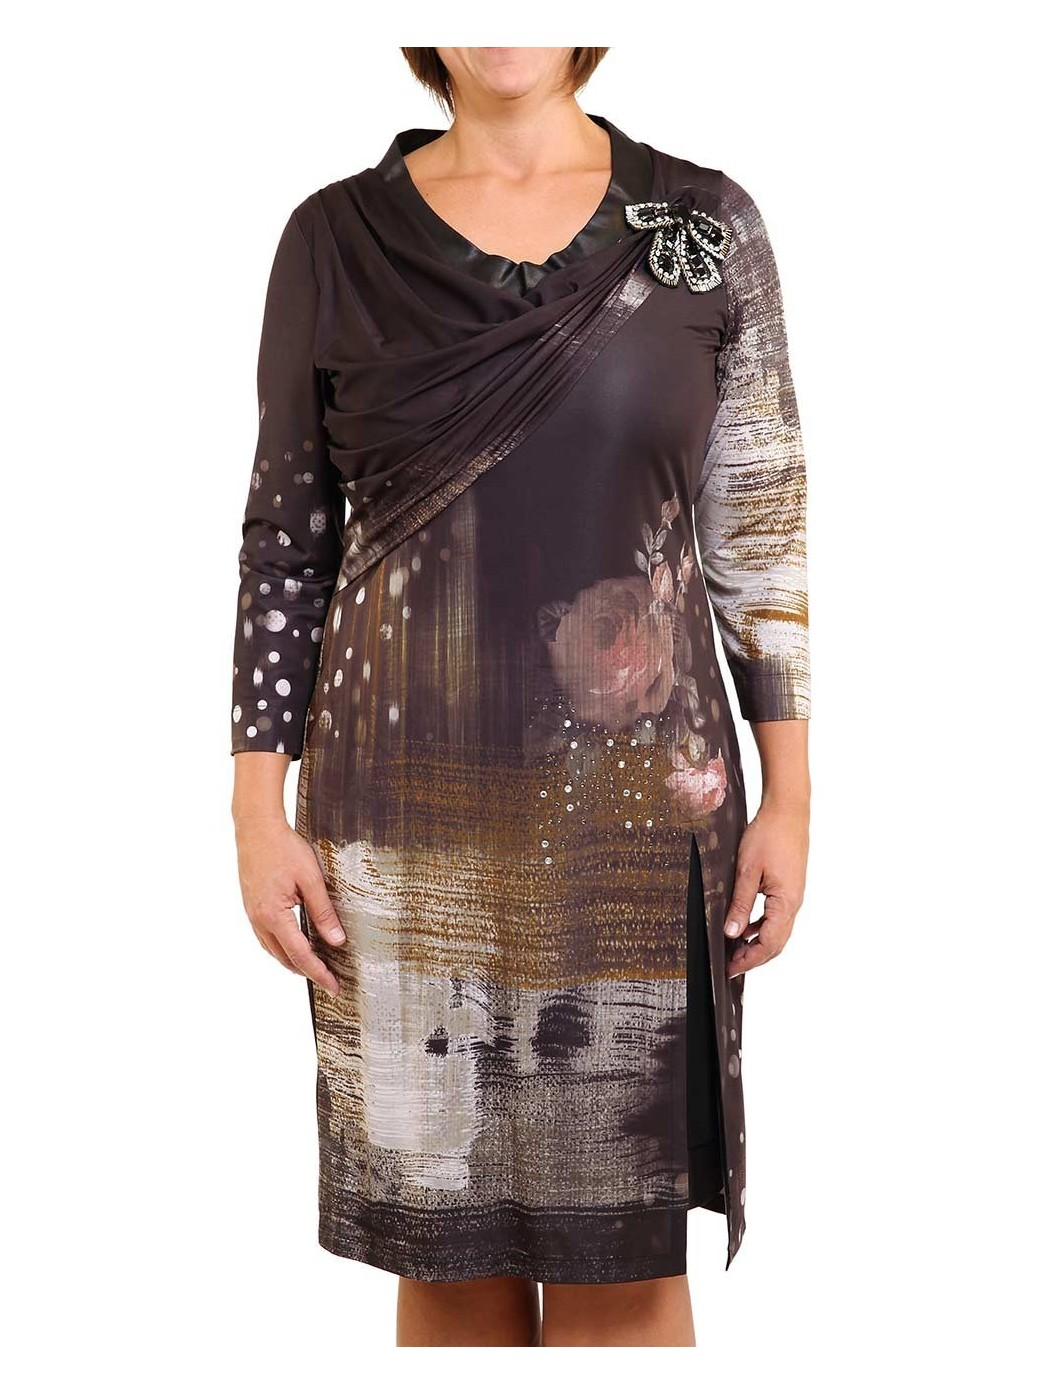 Maria D robe asymétrique